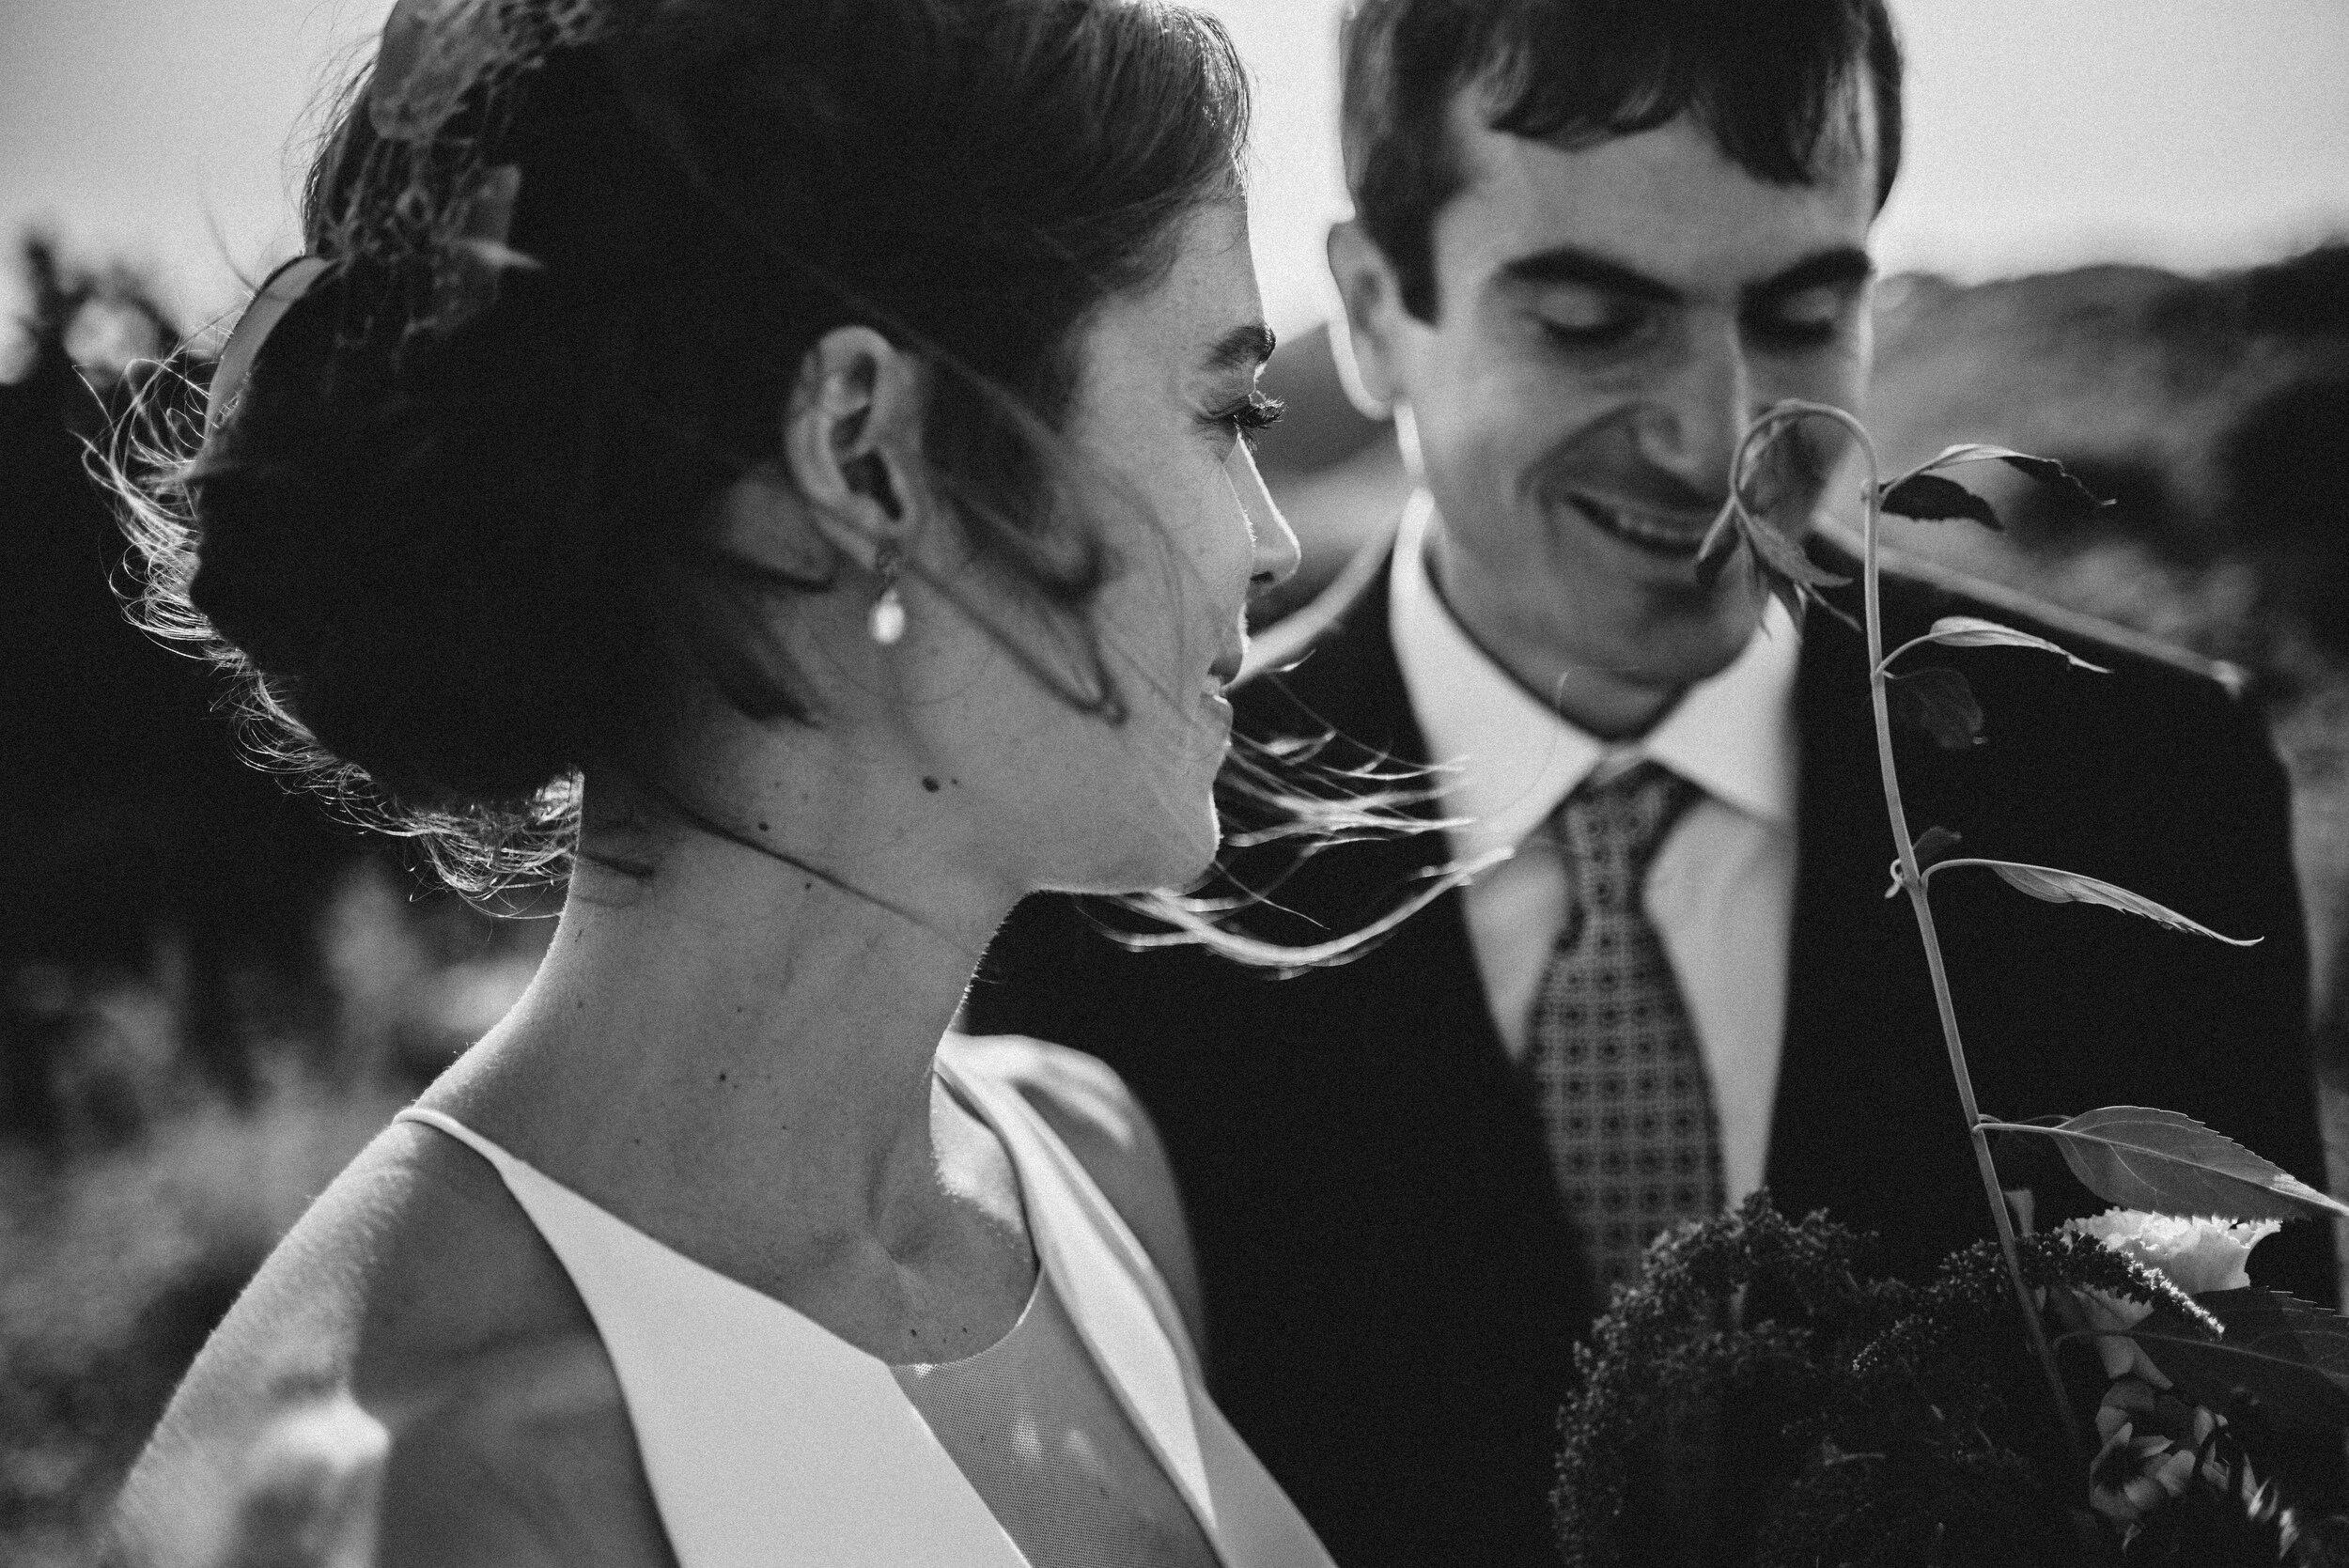 portland_city_hall_wedding_mikhail_glabet_34.JPG